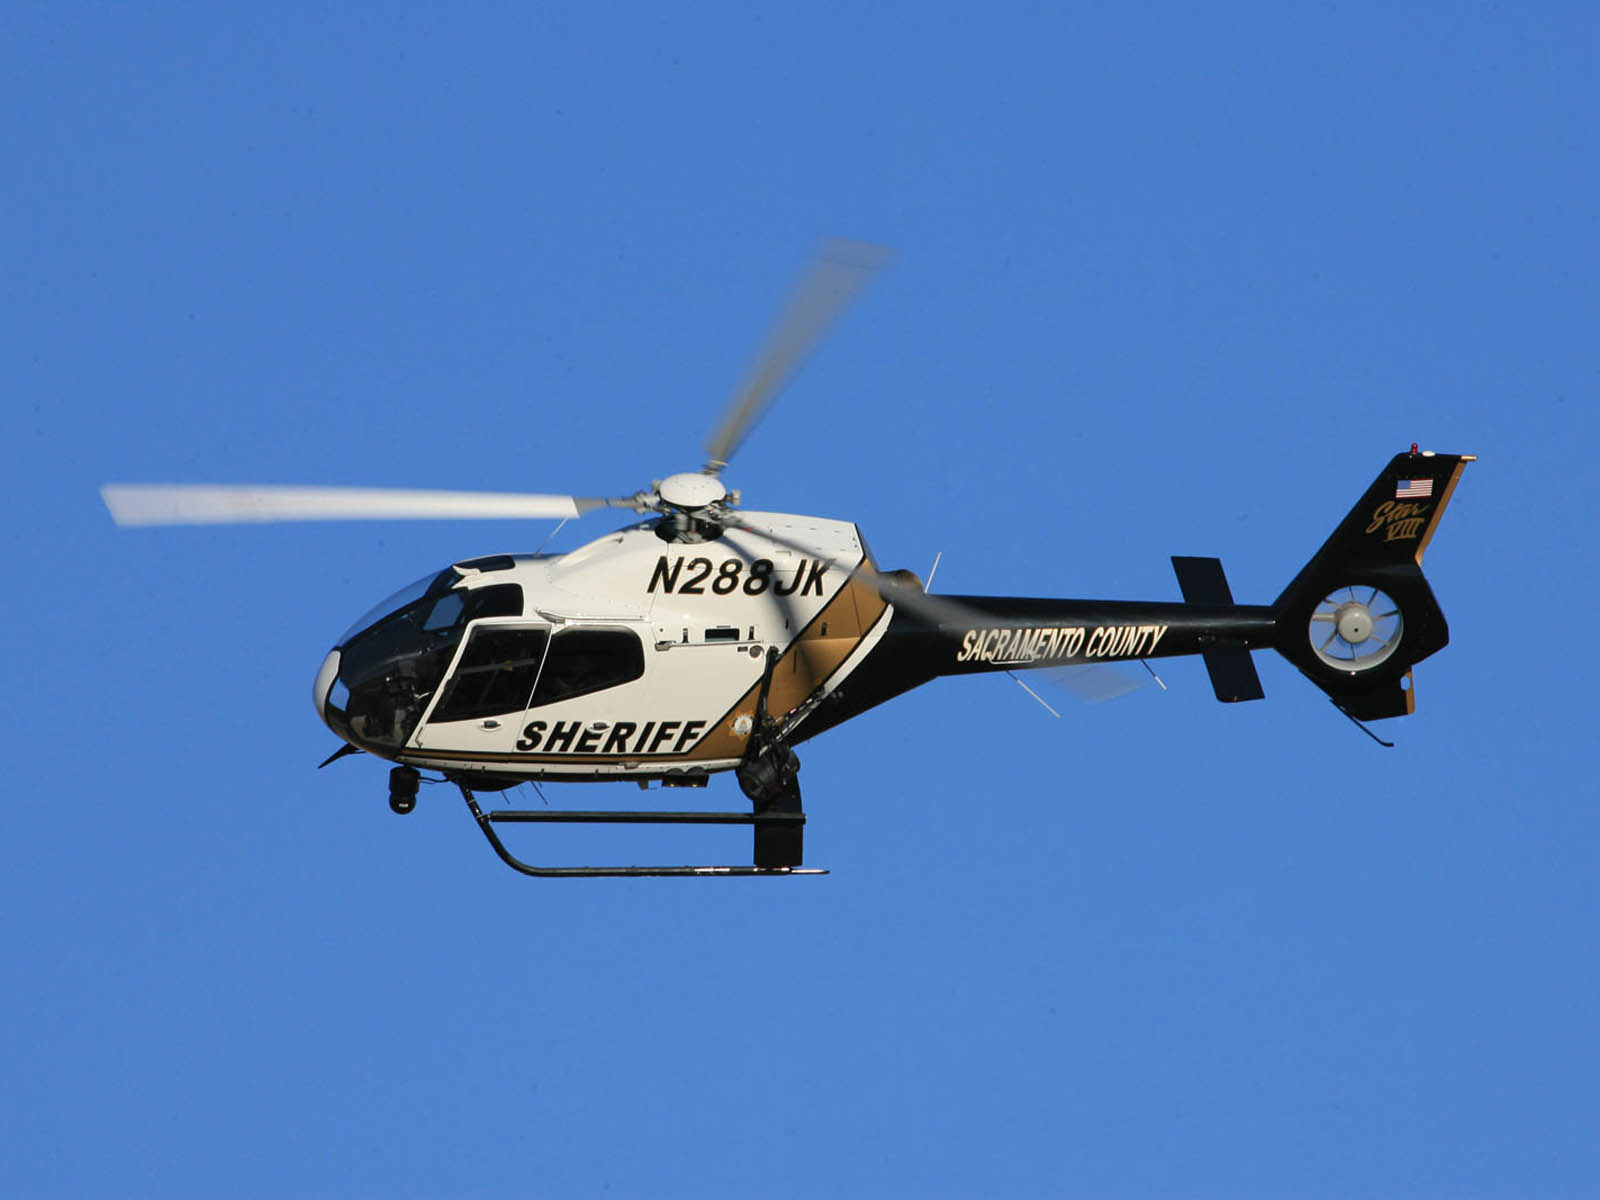 http://1.bp.blogspot.com/-sCxFJgL3M8Q/UDHlxelJh1I/AAAAAAAAHrI/FuD1V-PtqPg/s1600/Eurocopter+EC+120+Wallpapers+1.jpg